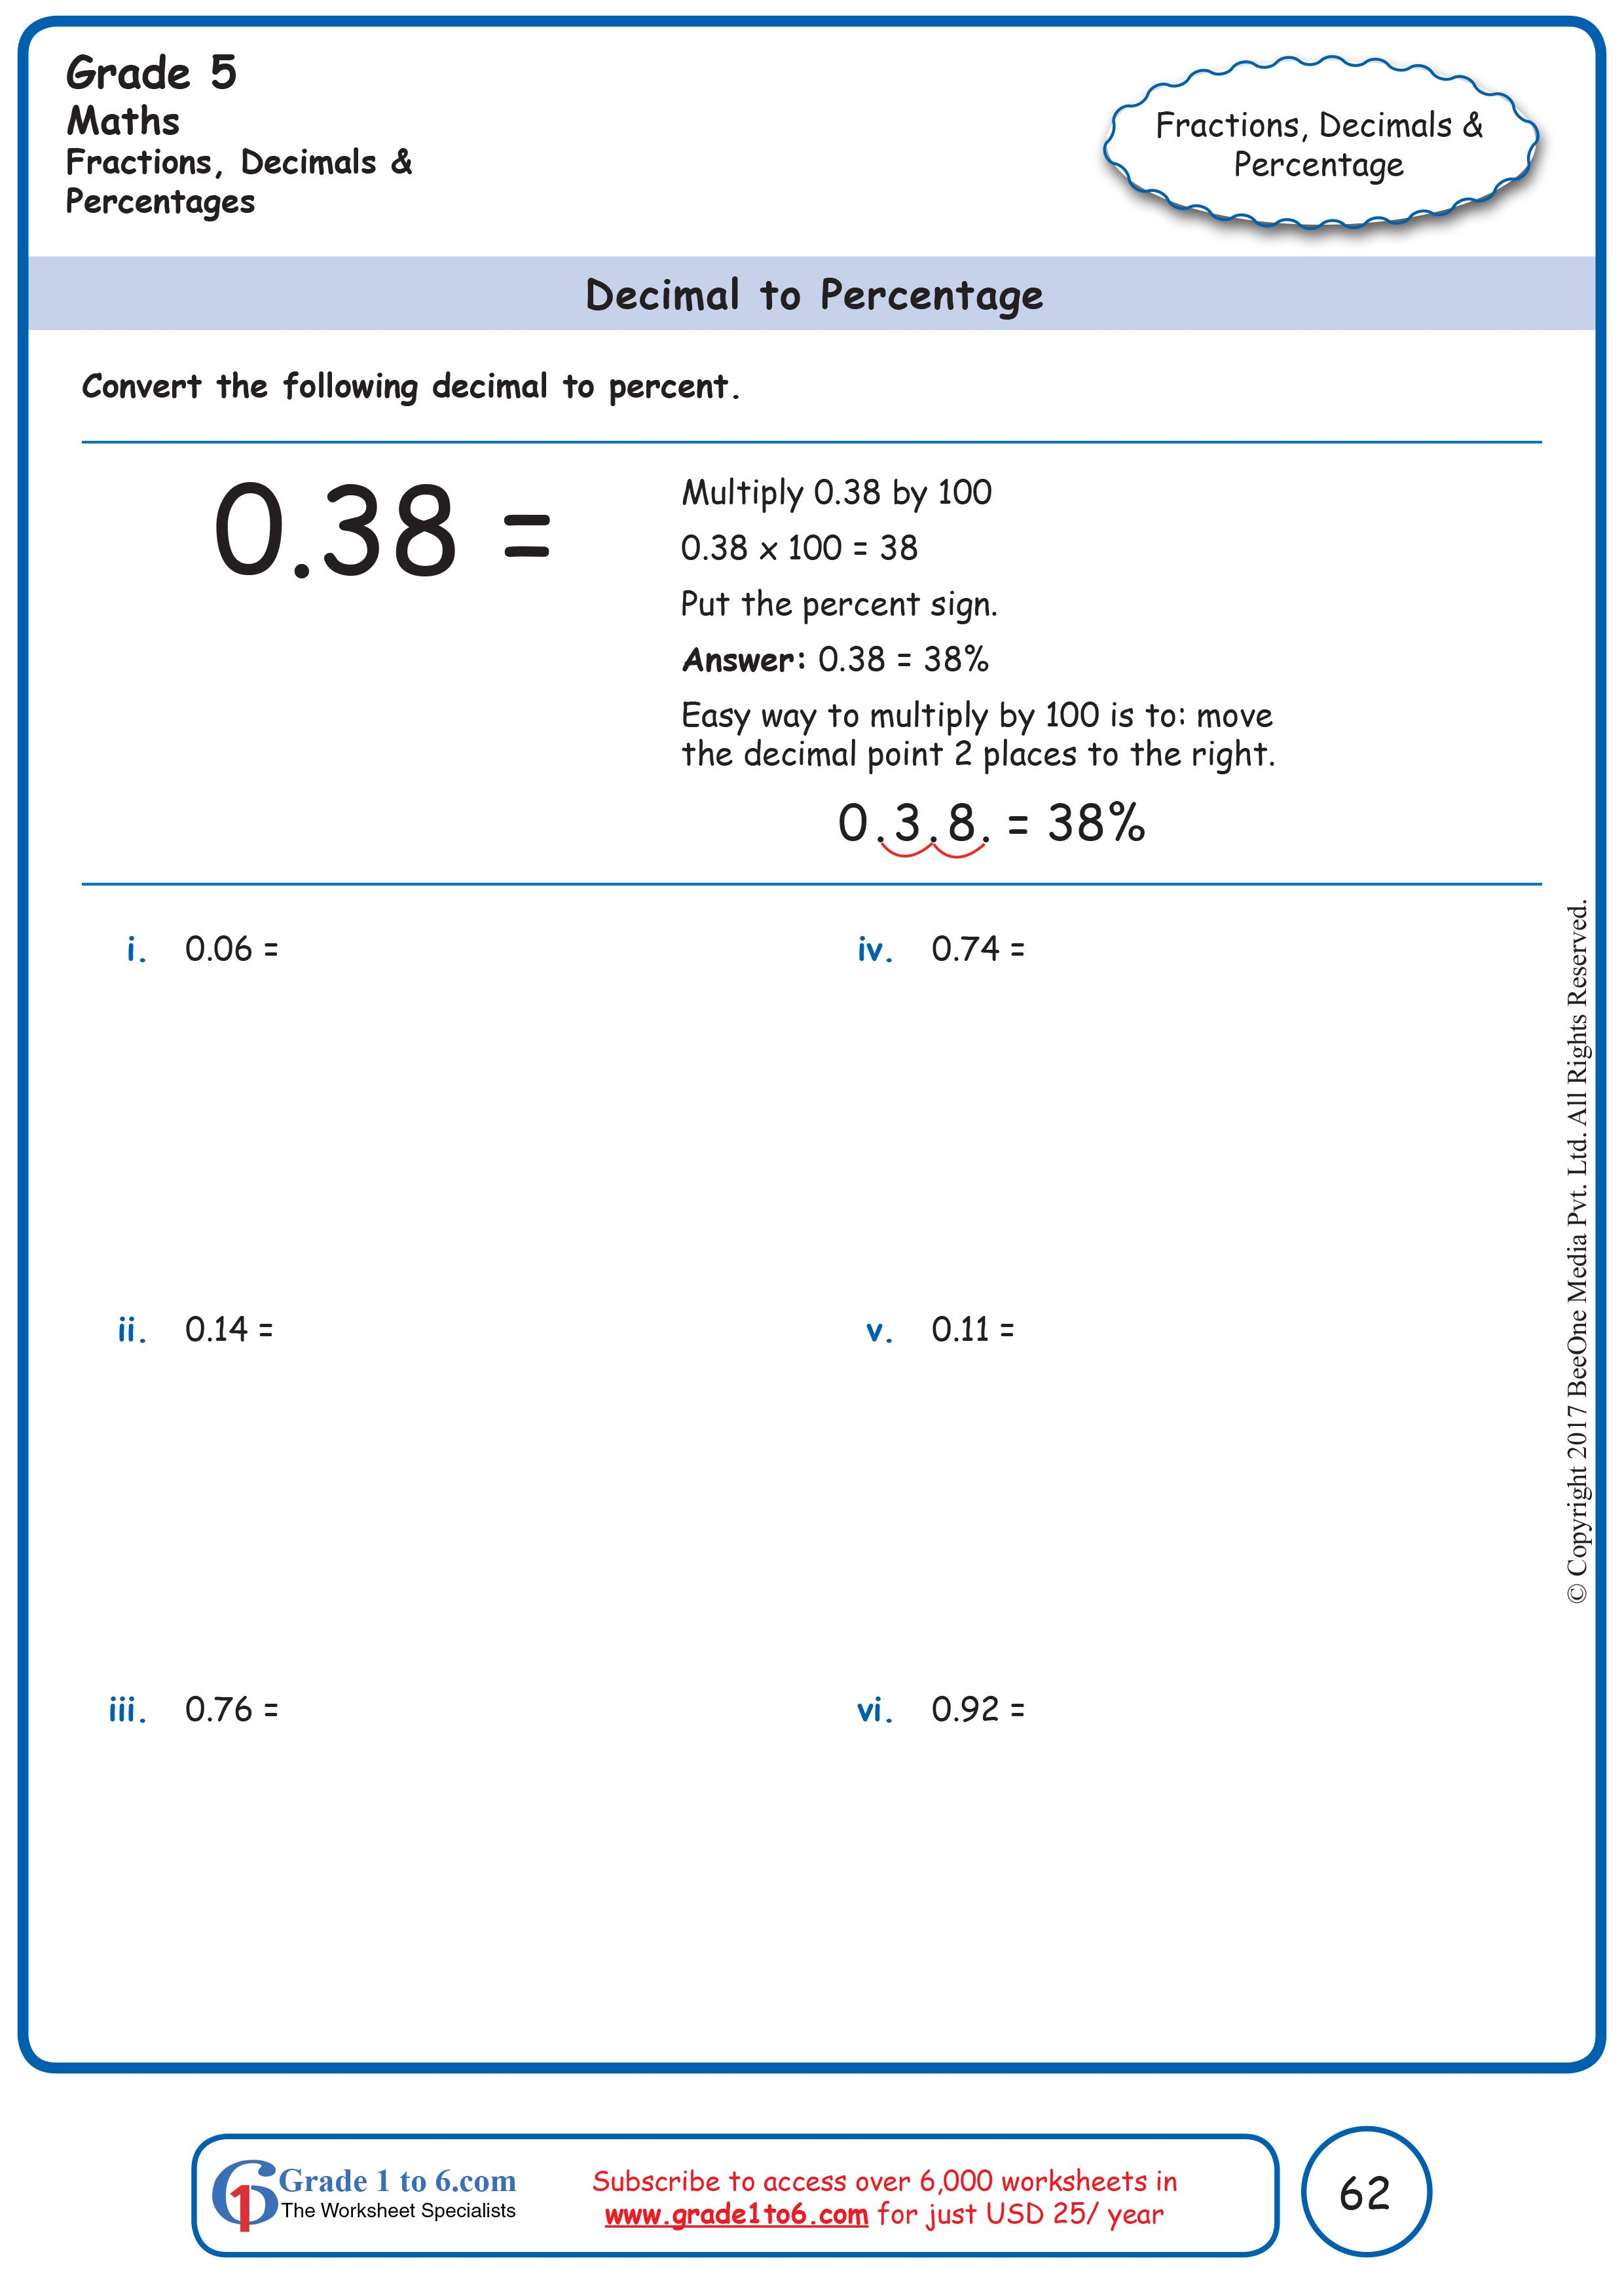 Pin On Grade 5 Math Worksheets Pyp Cbse Icse Common Core